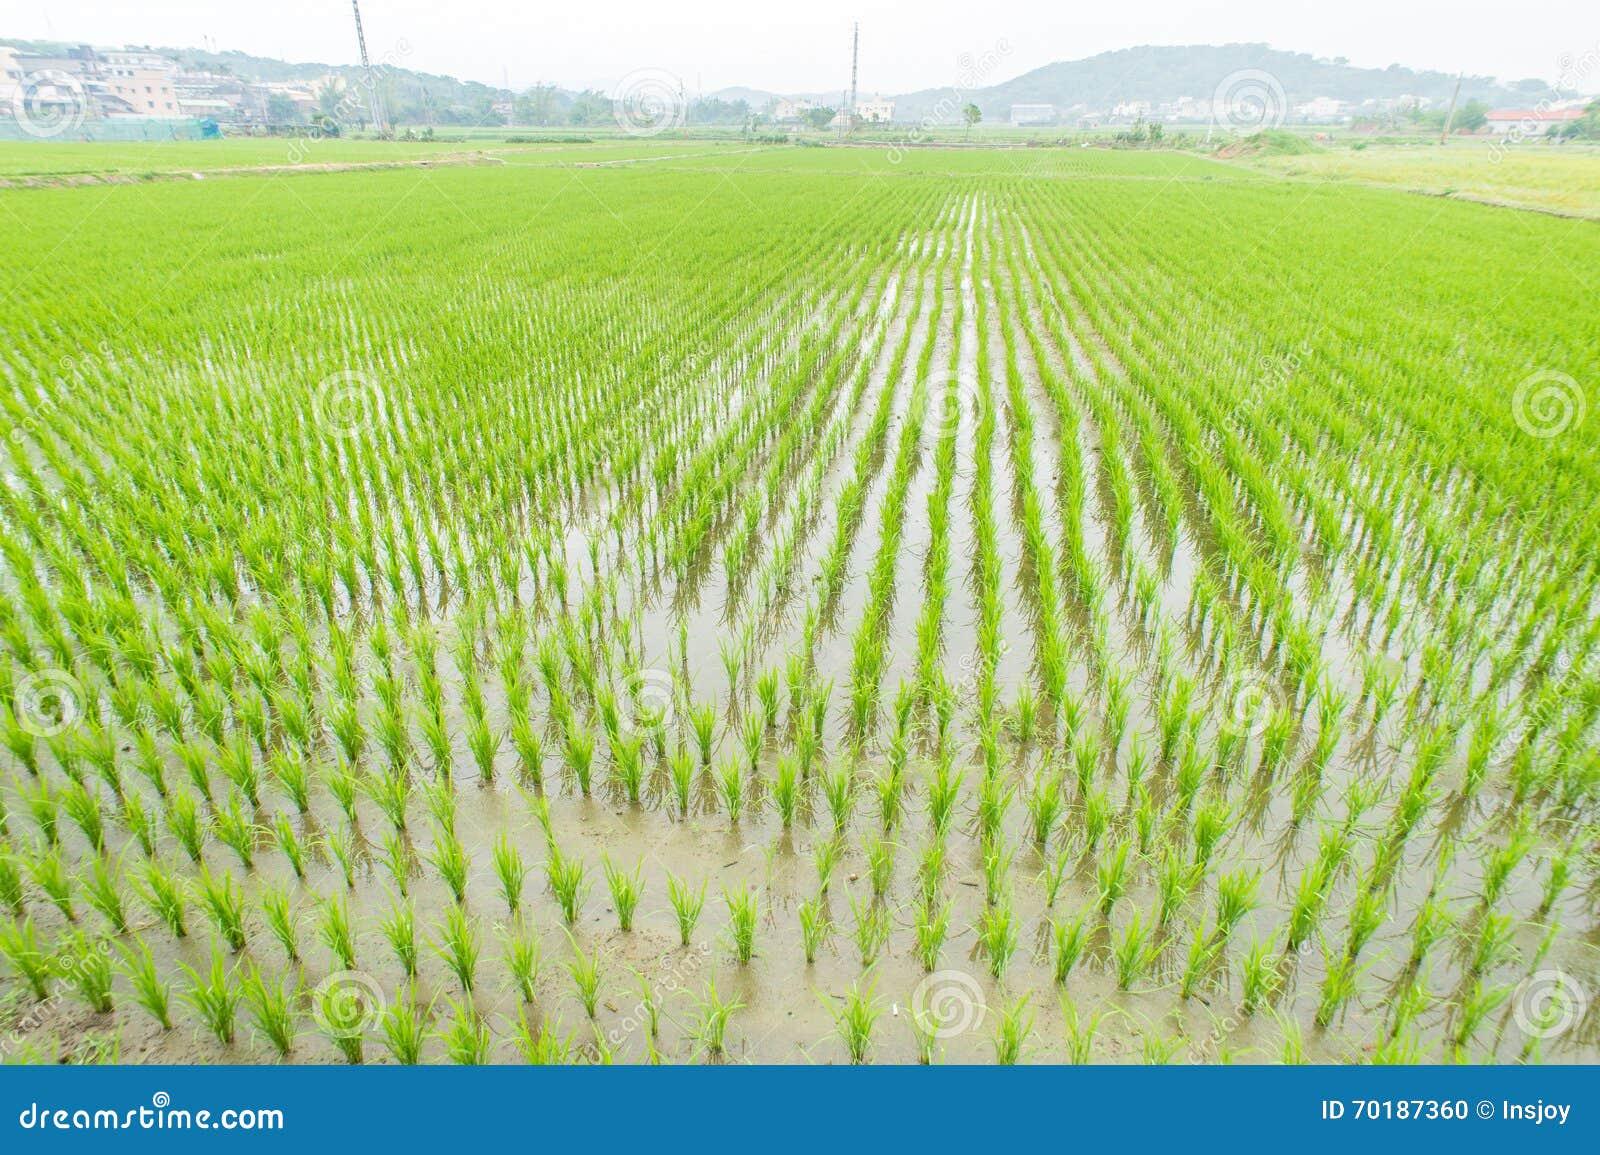 Paddy field (rice field)